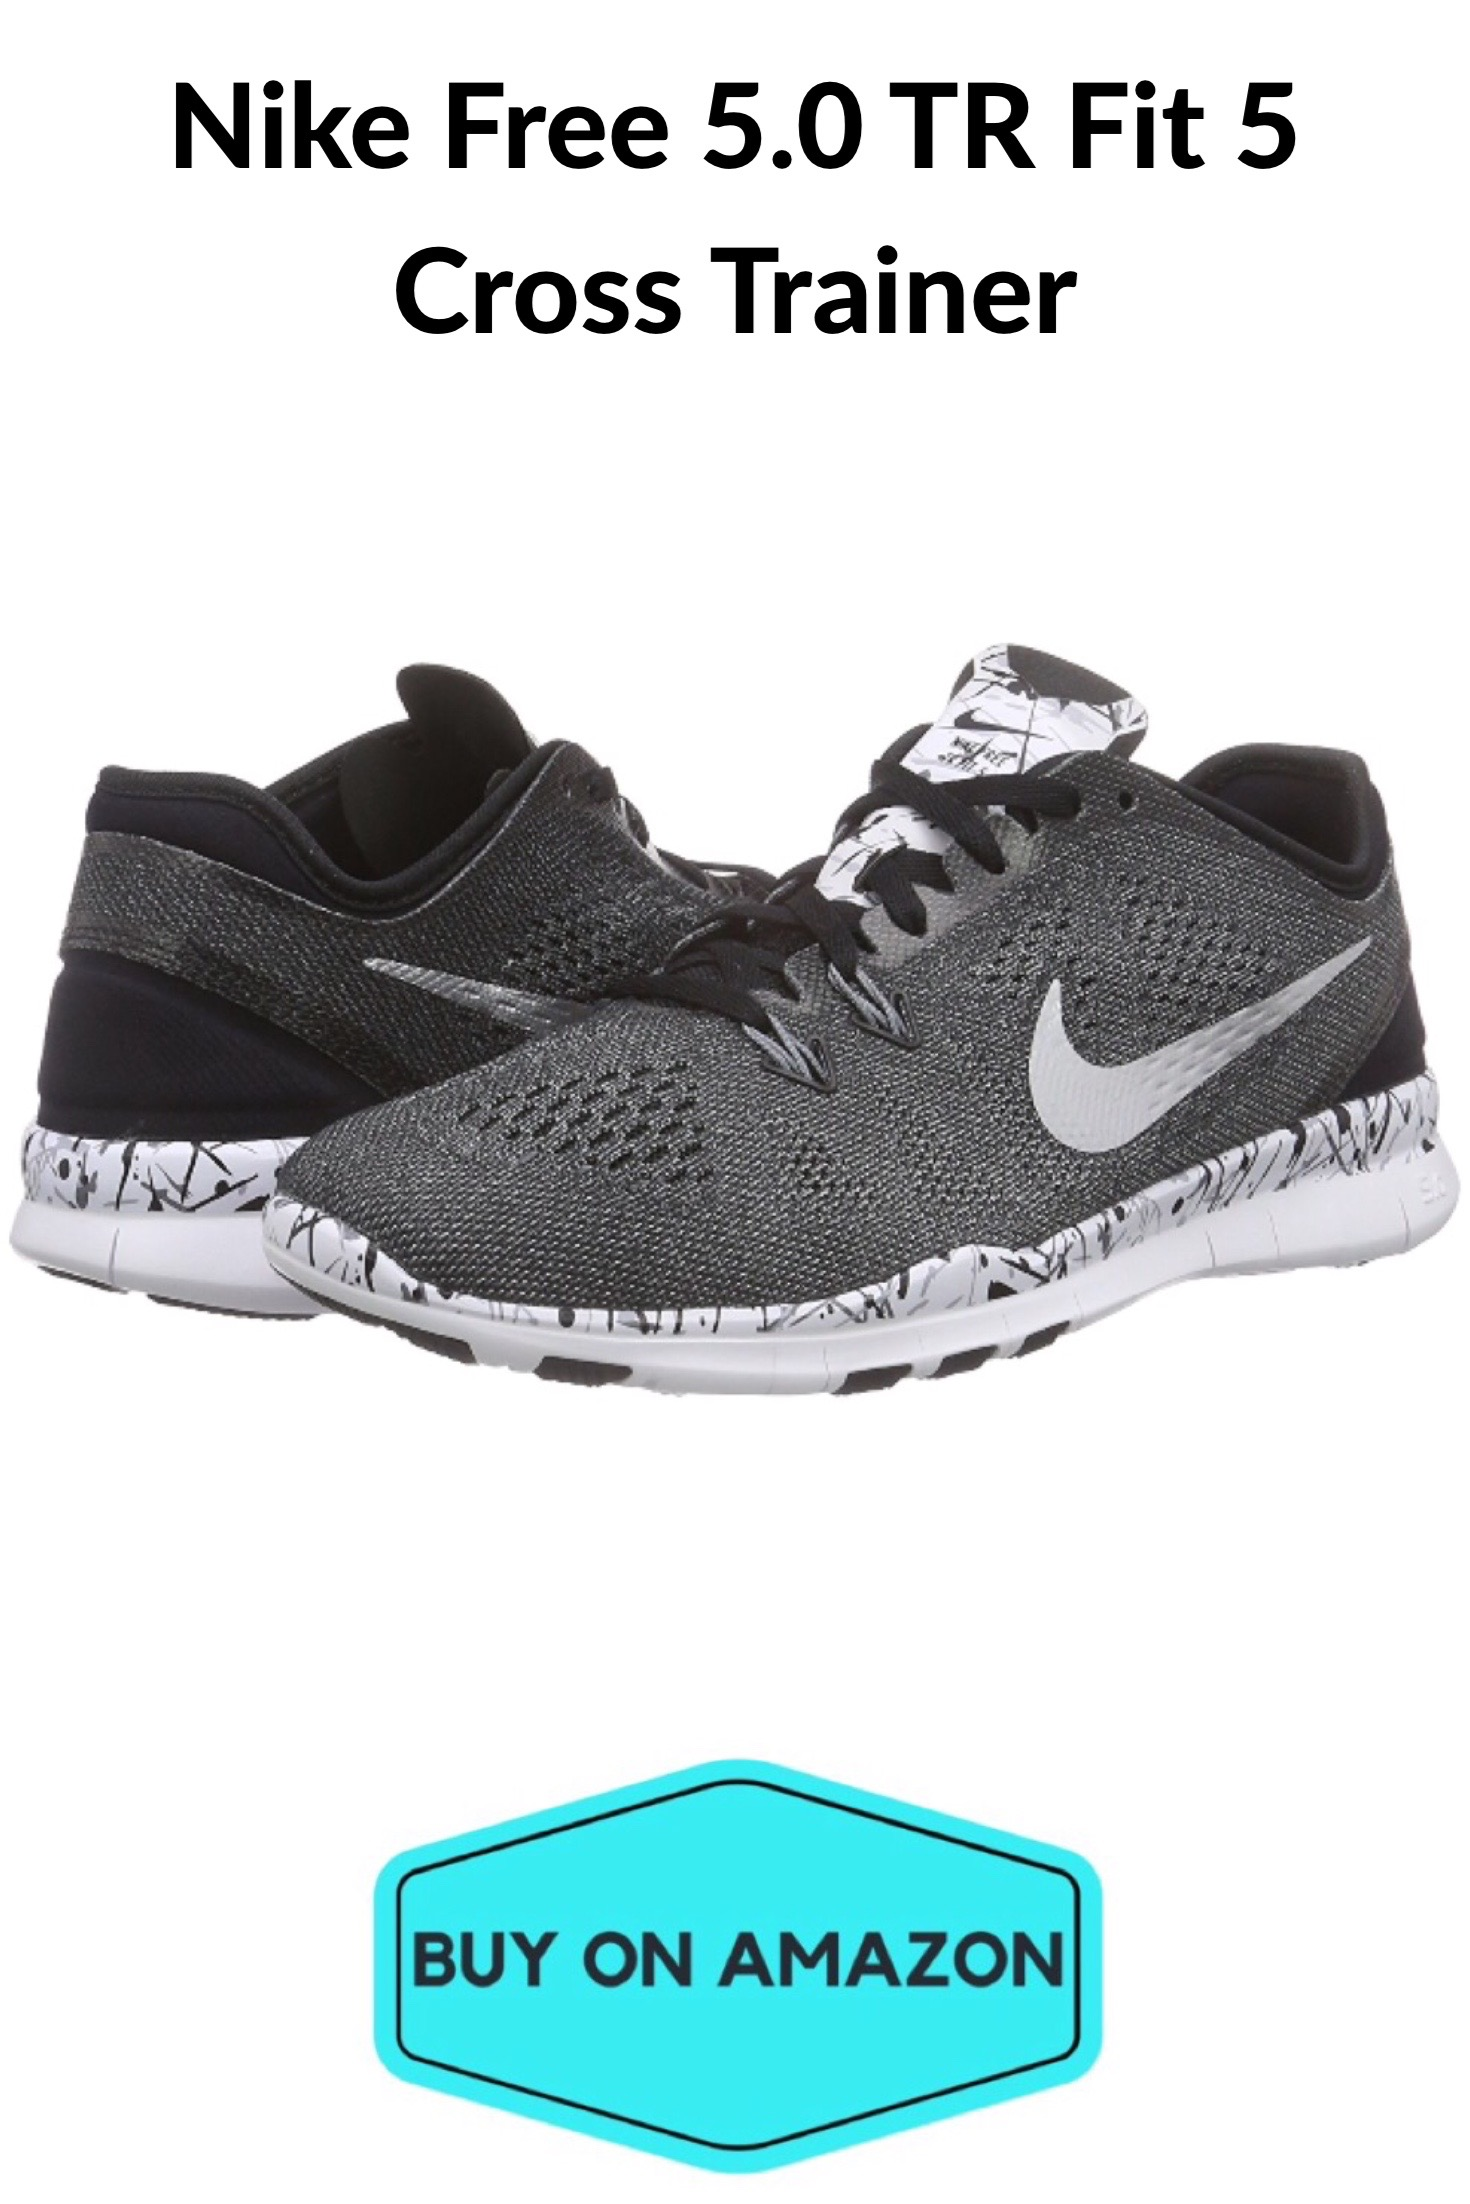 Nike Free 5.0 TR Fit 5 Women's Cross Trainer